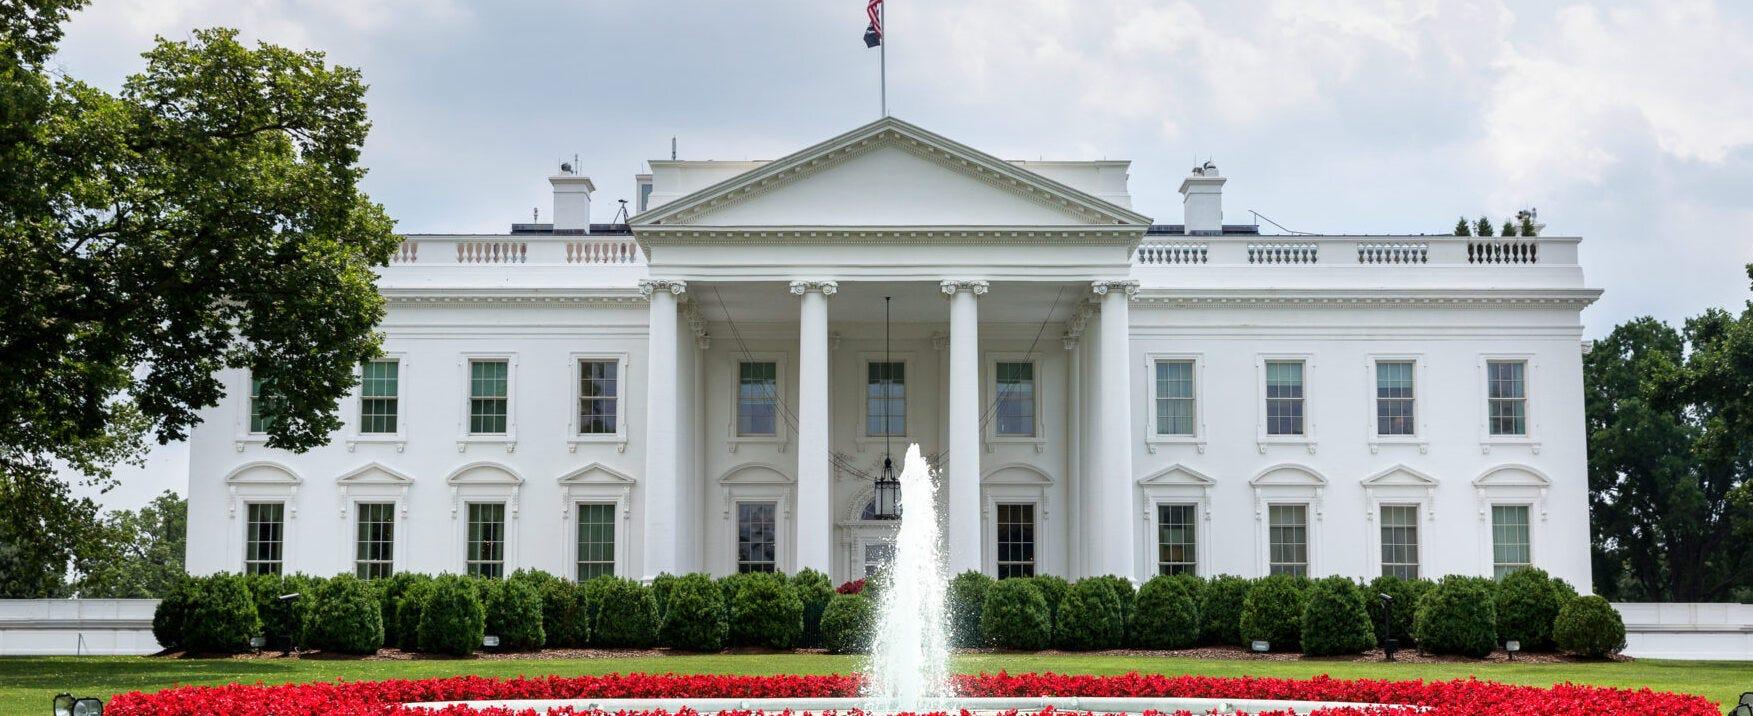 Should a President's financials be public record?